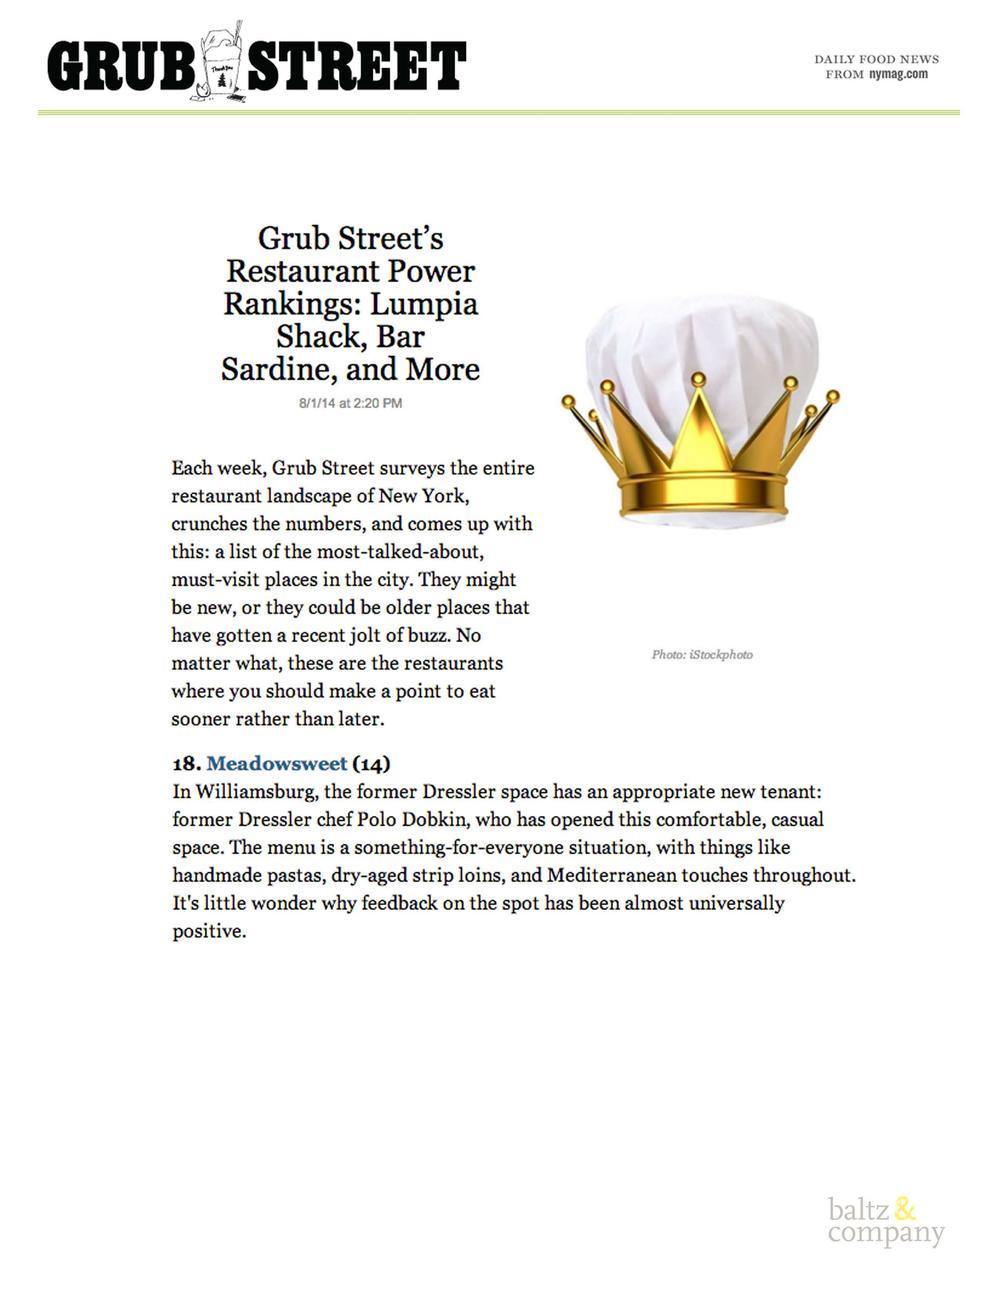 GrubStreet-7.jpg